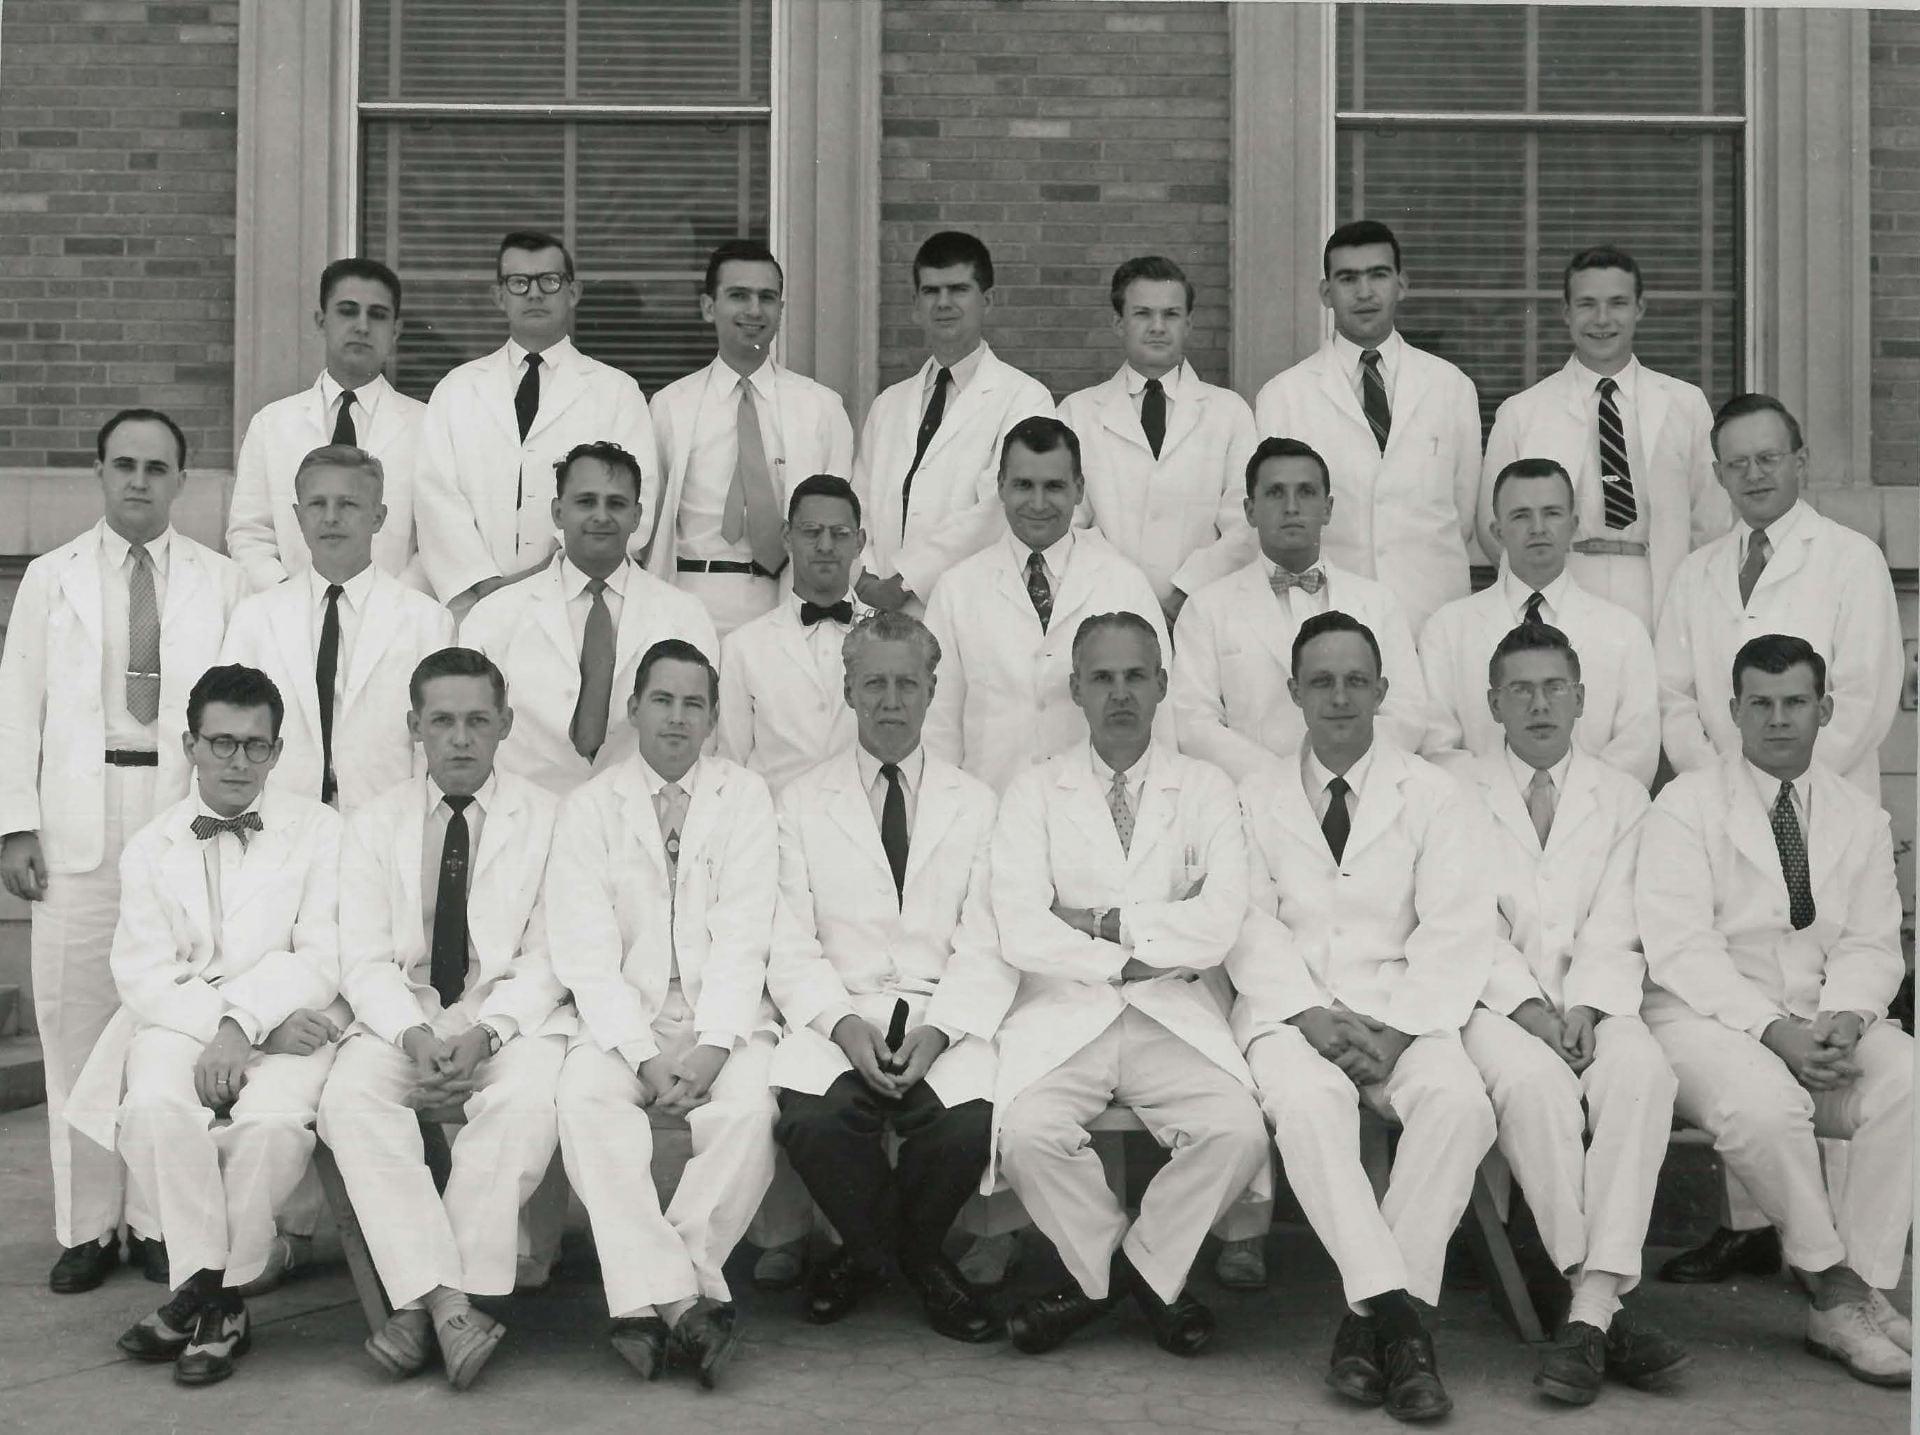 1954 Housestaff Photo (1)